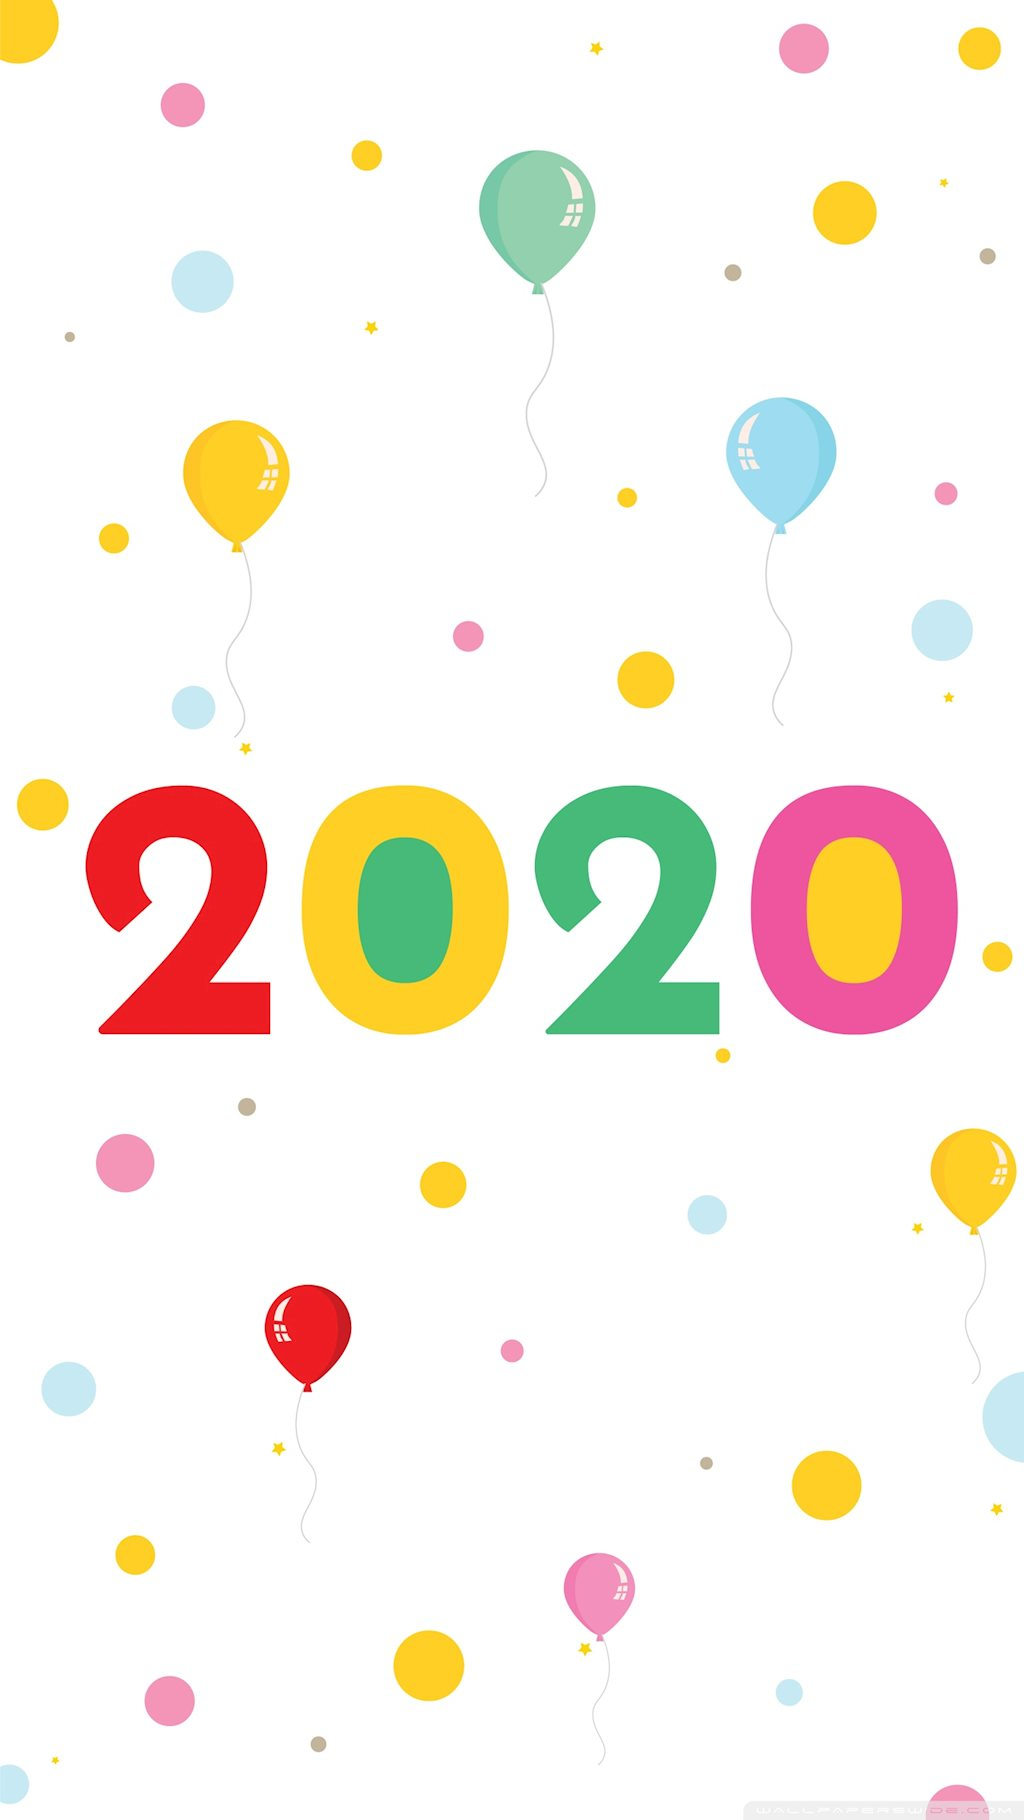 b6-hinh-nen-tet-2020-cho-dien-thoai-hinh-nen-nam-moi-xuan-2020-cho-iphone-anh-nen-2020-dep-cho-smartphone.jpg